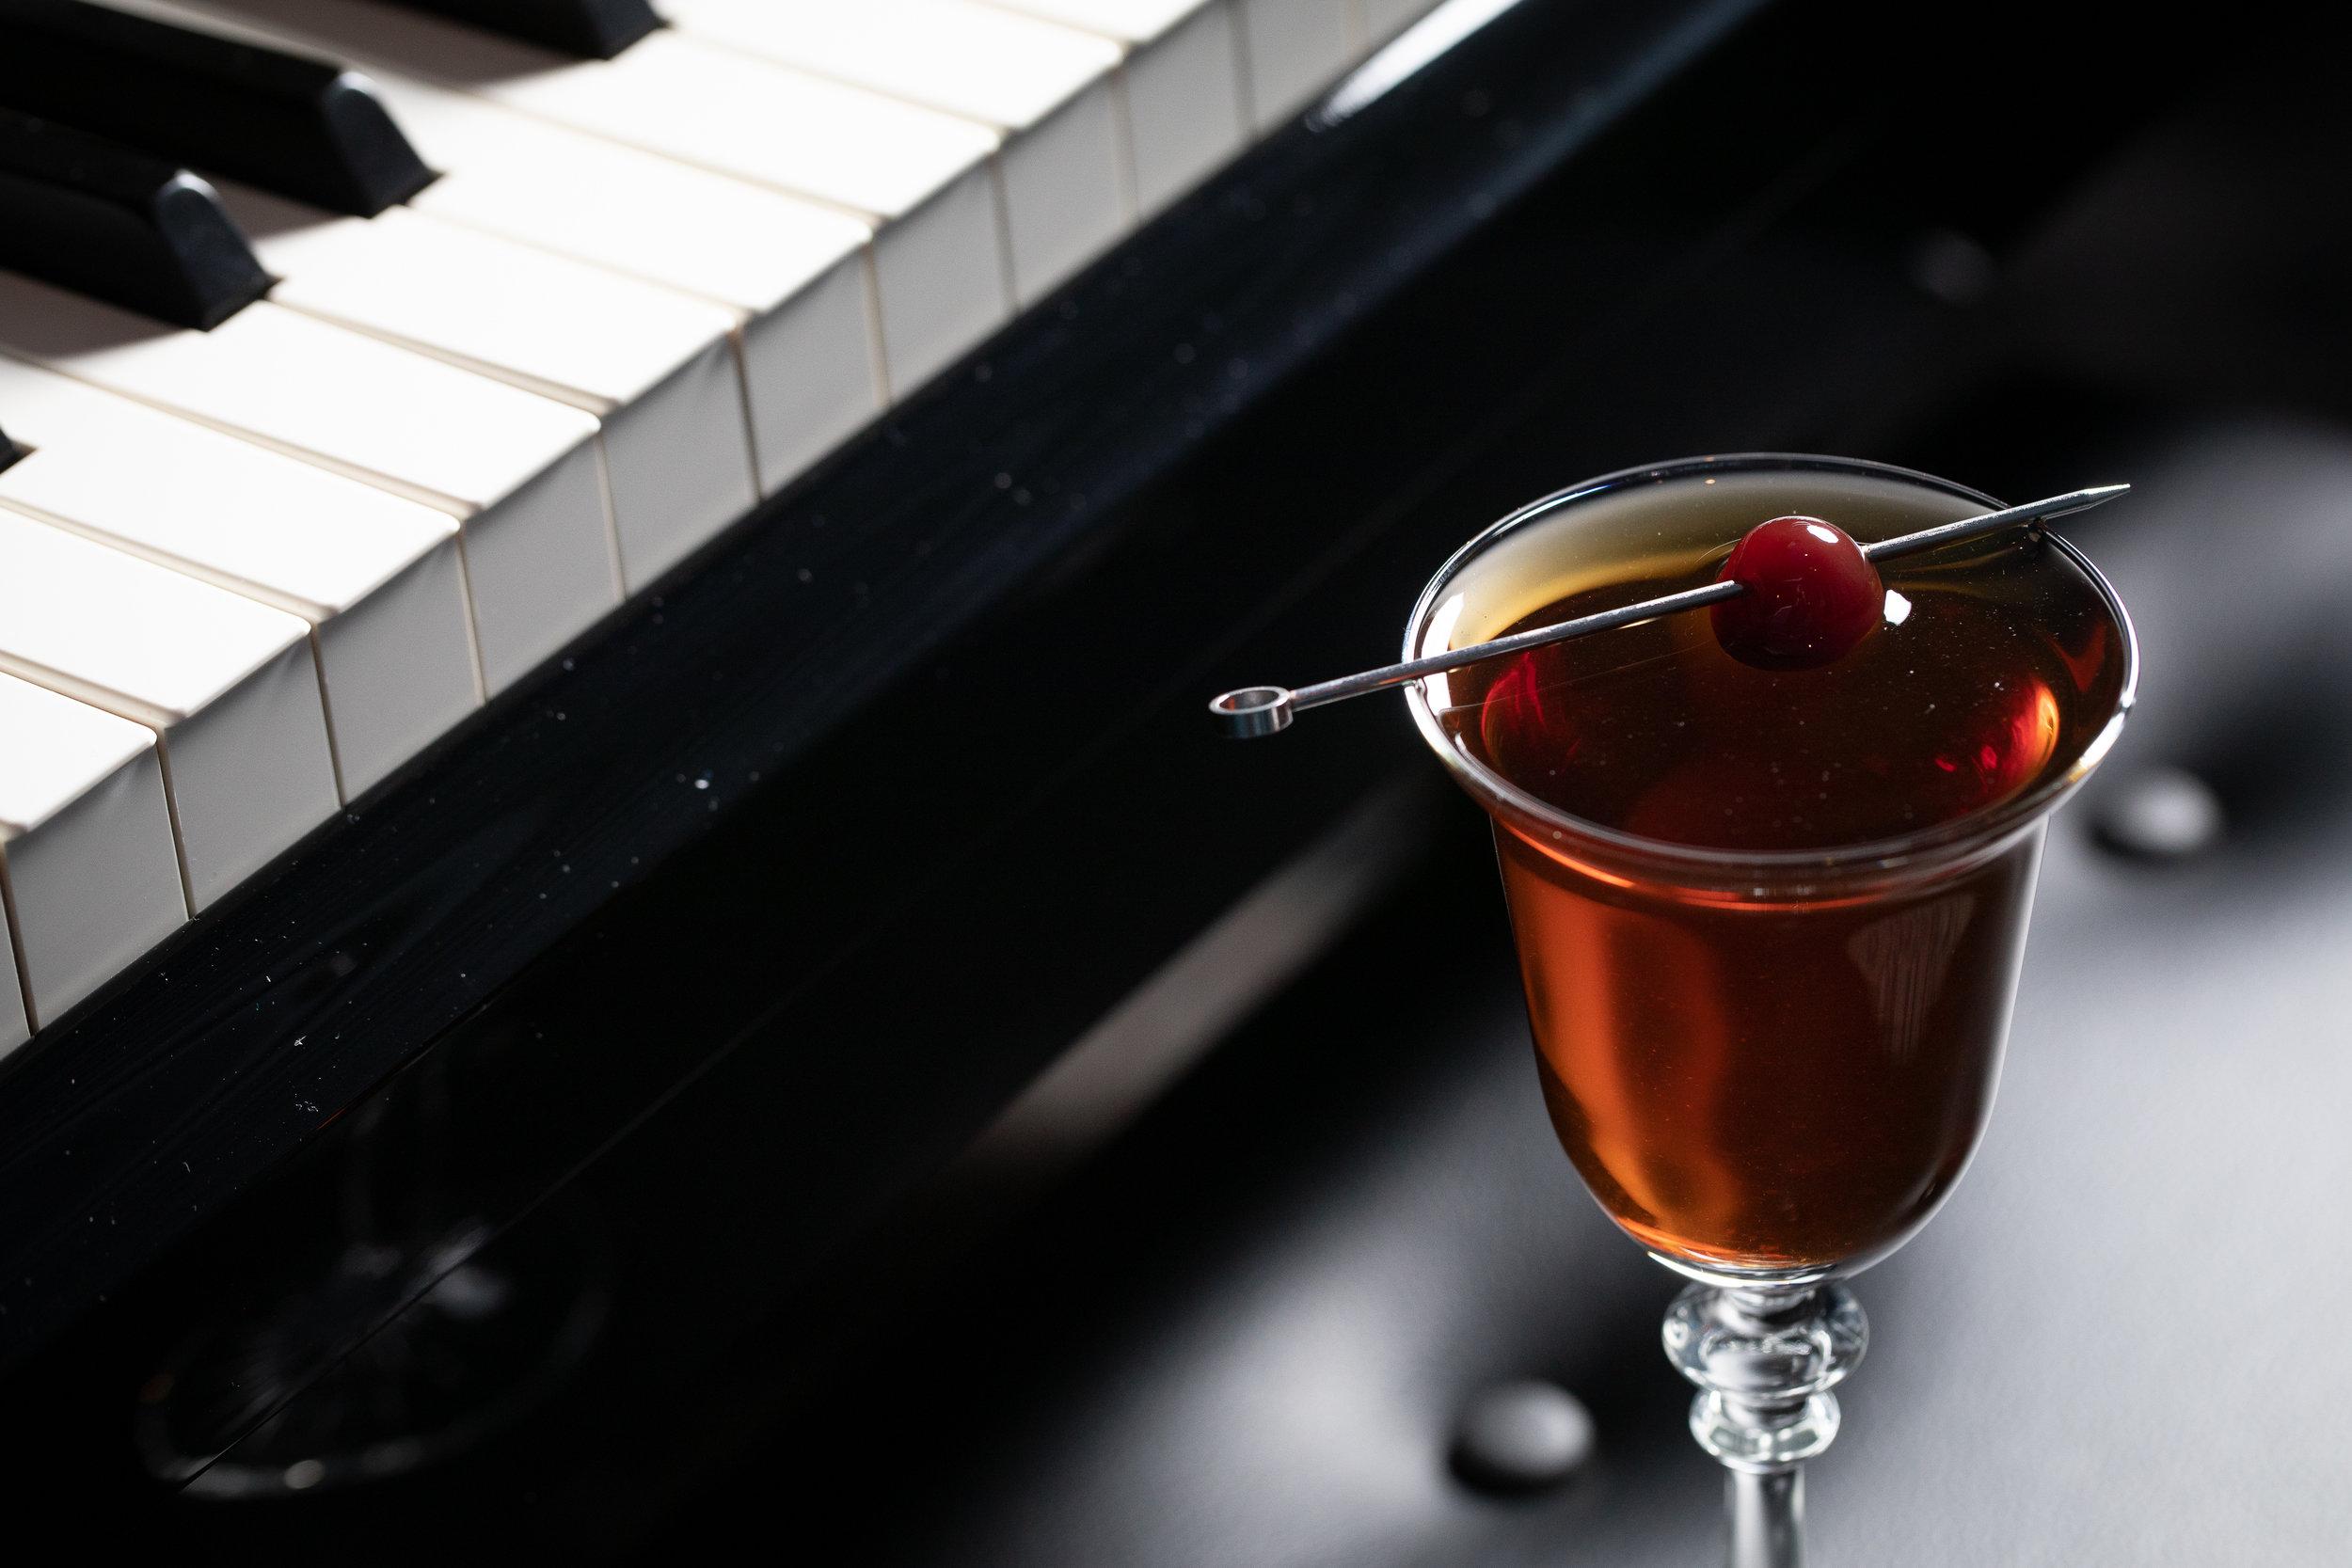 Lazy Bird cocktails-baby darling-2-GALDOPHOTO Hoxton_26Mar2019_HG0006.jpg